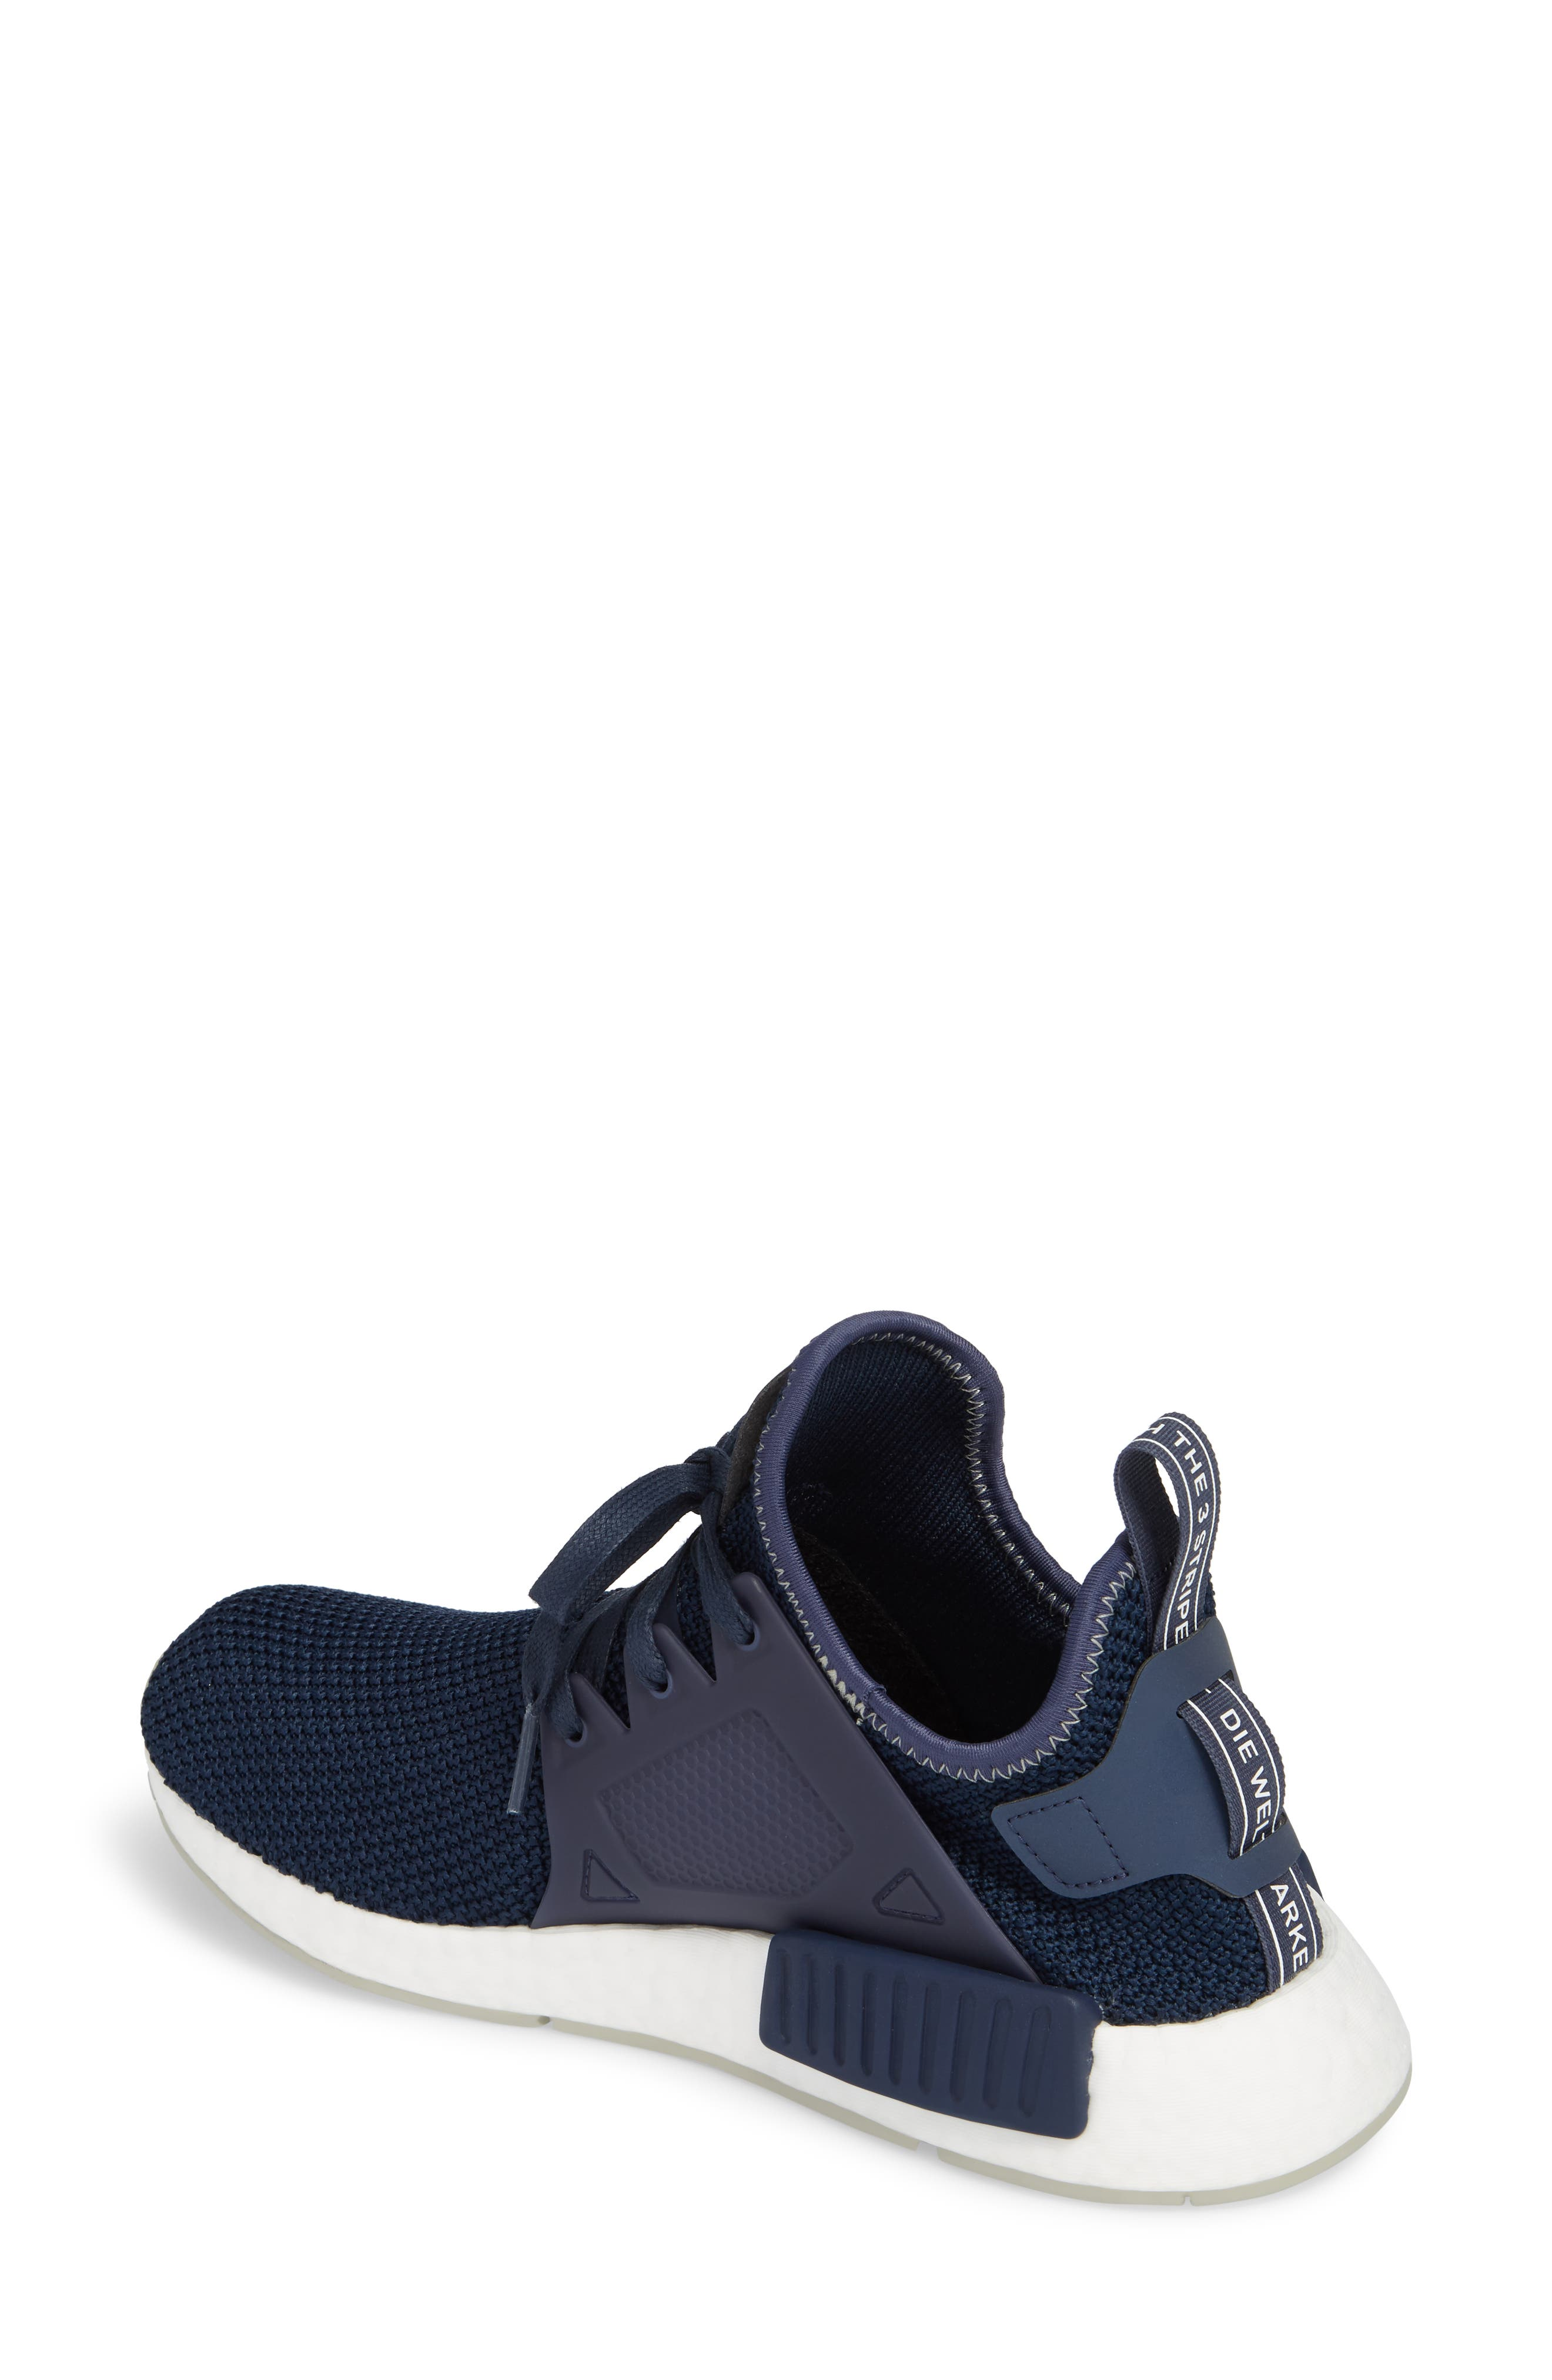 NMD XR1 Athletic Shoe,                             Alternate thumbnail 2, color,                             Trace Blue/ Sesame